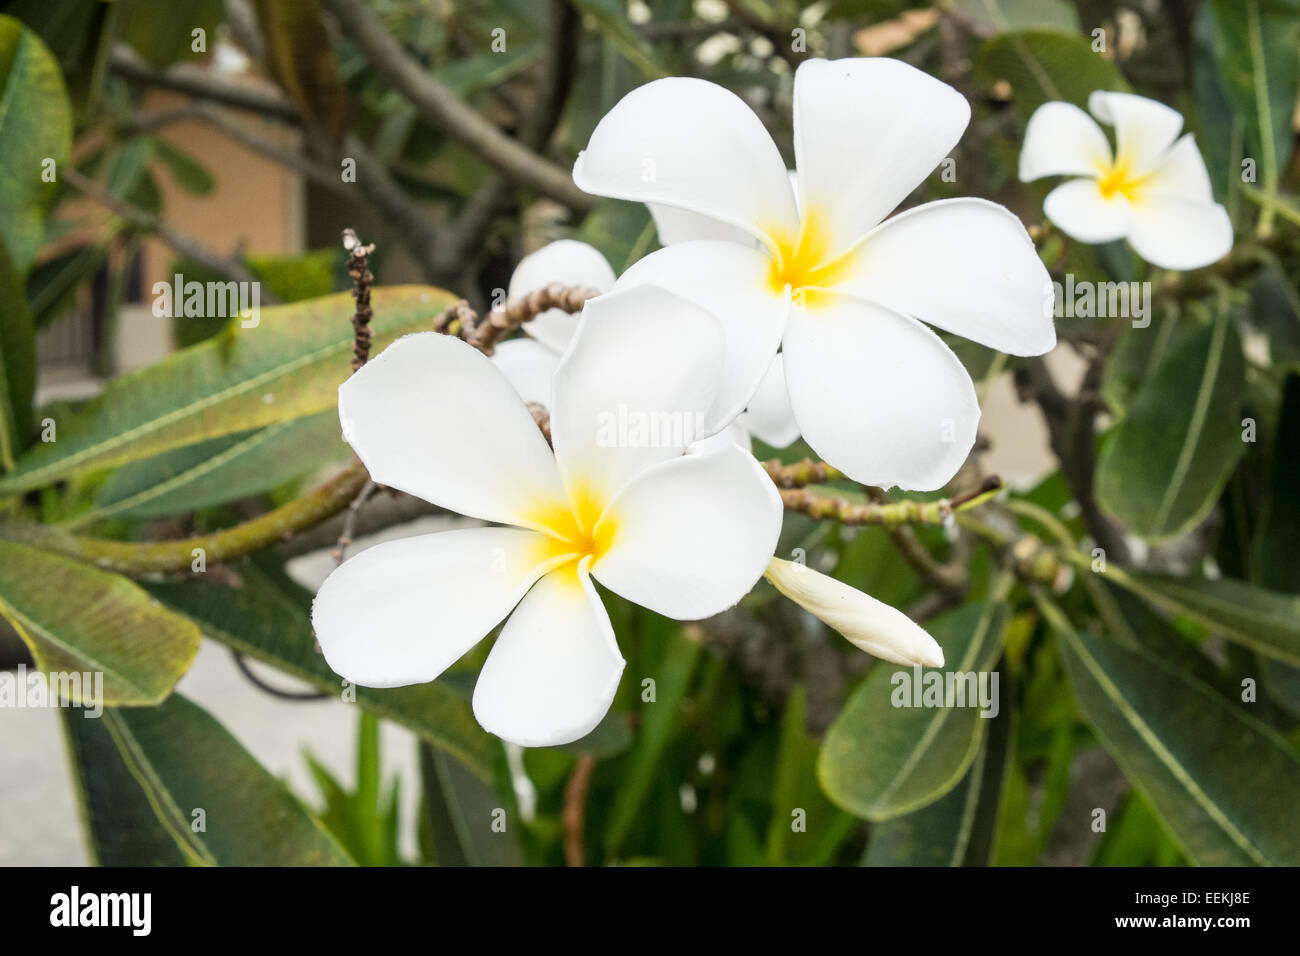 Five Petal White Flowers Frangipani Stock Photos Five Petal White